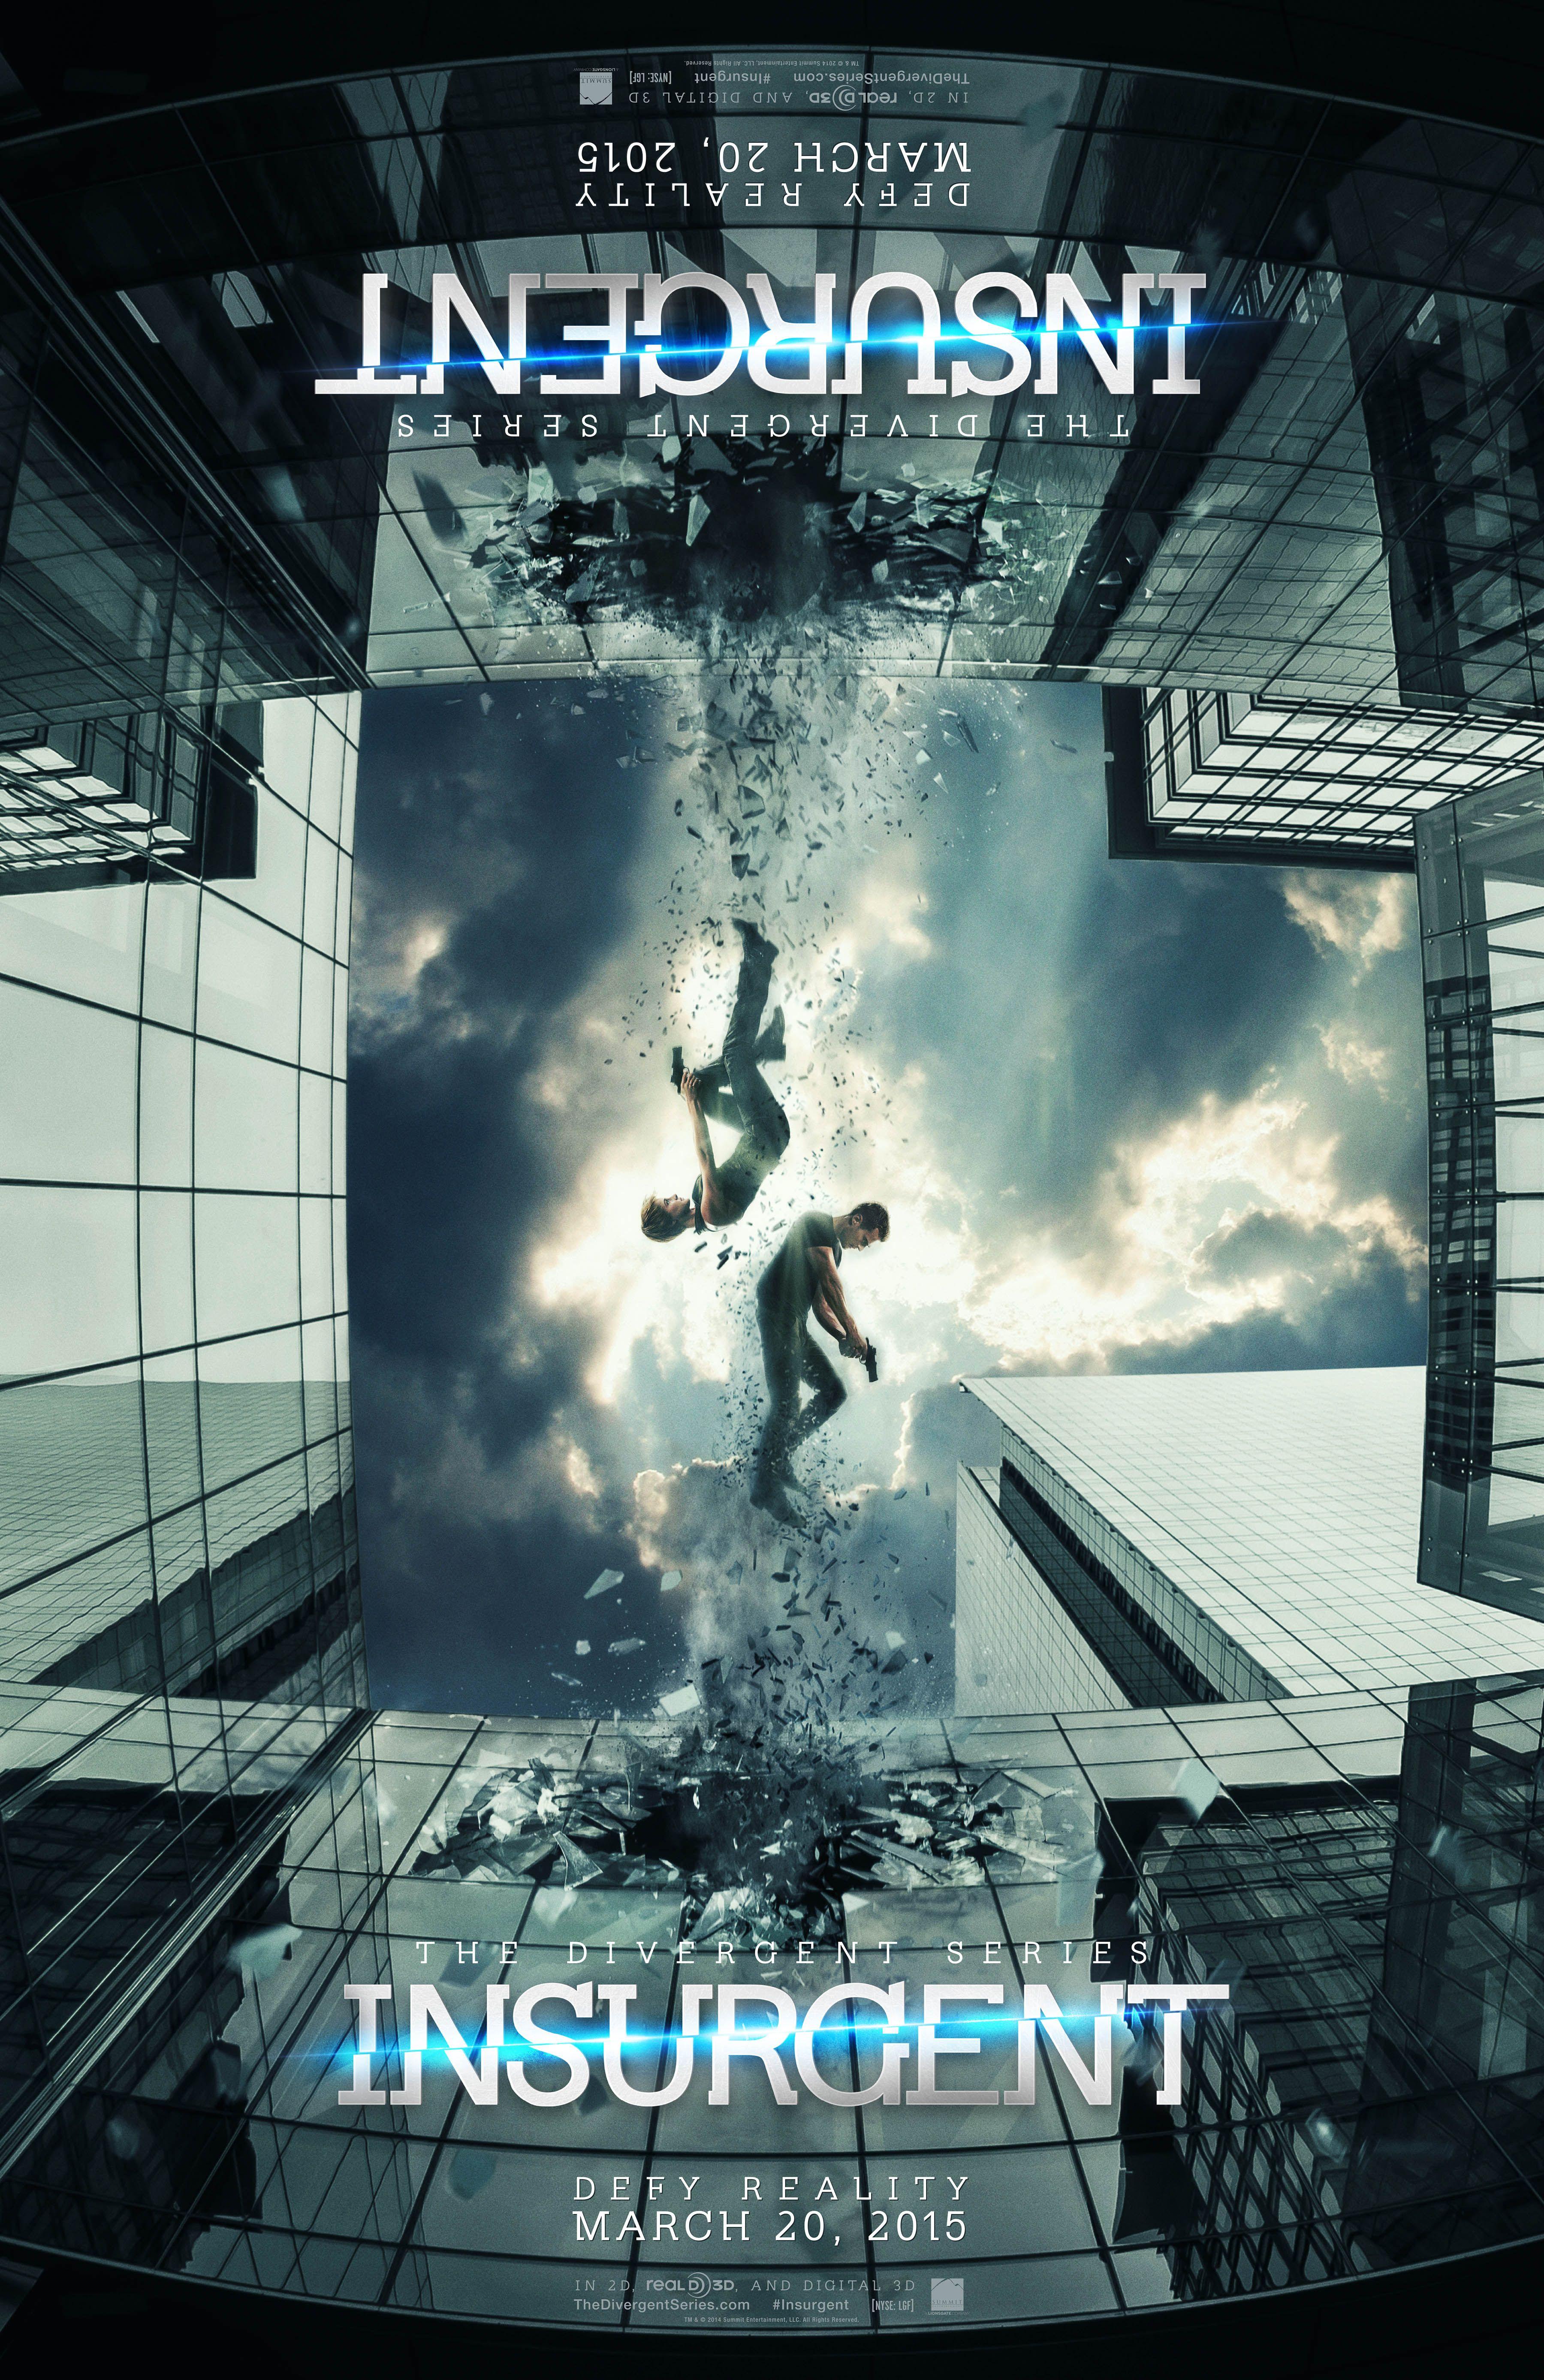 Divergente 2 Streaming Vf : divergente, streaming, Insurgent, Whole, Sexier, Trailer, Movie,, Divergent, Series,, Movies